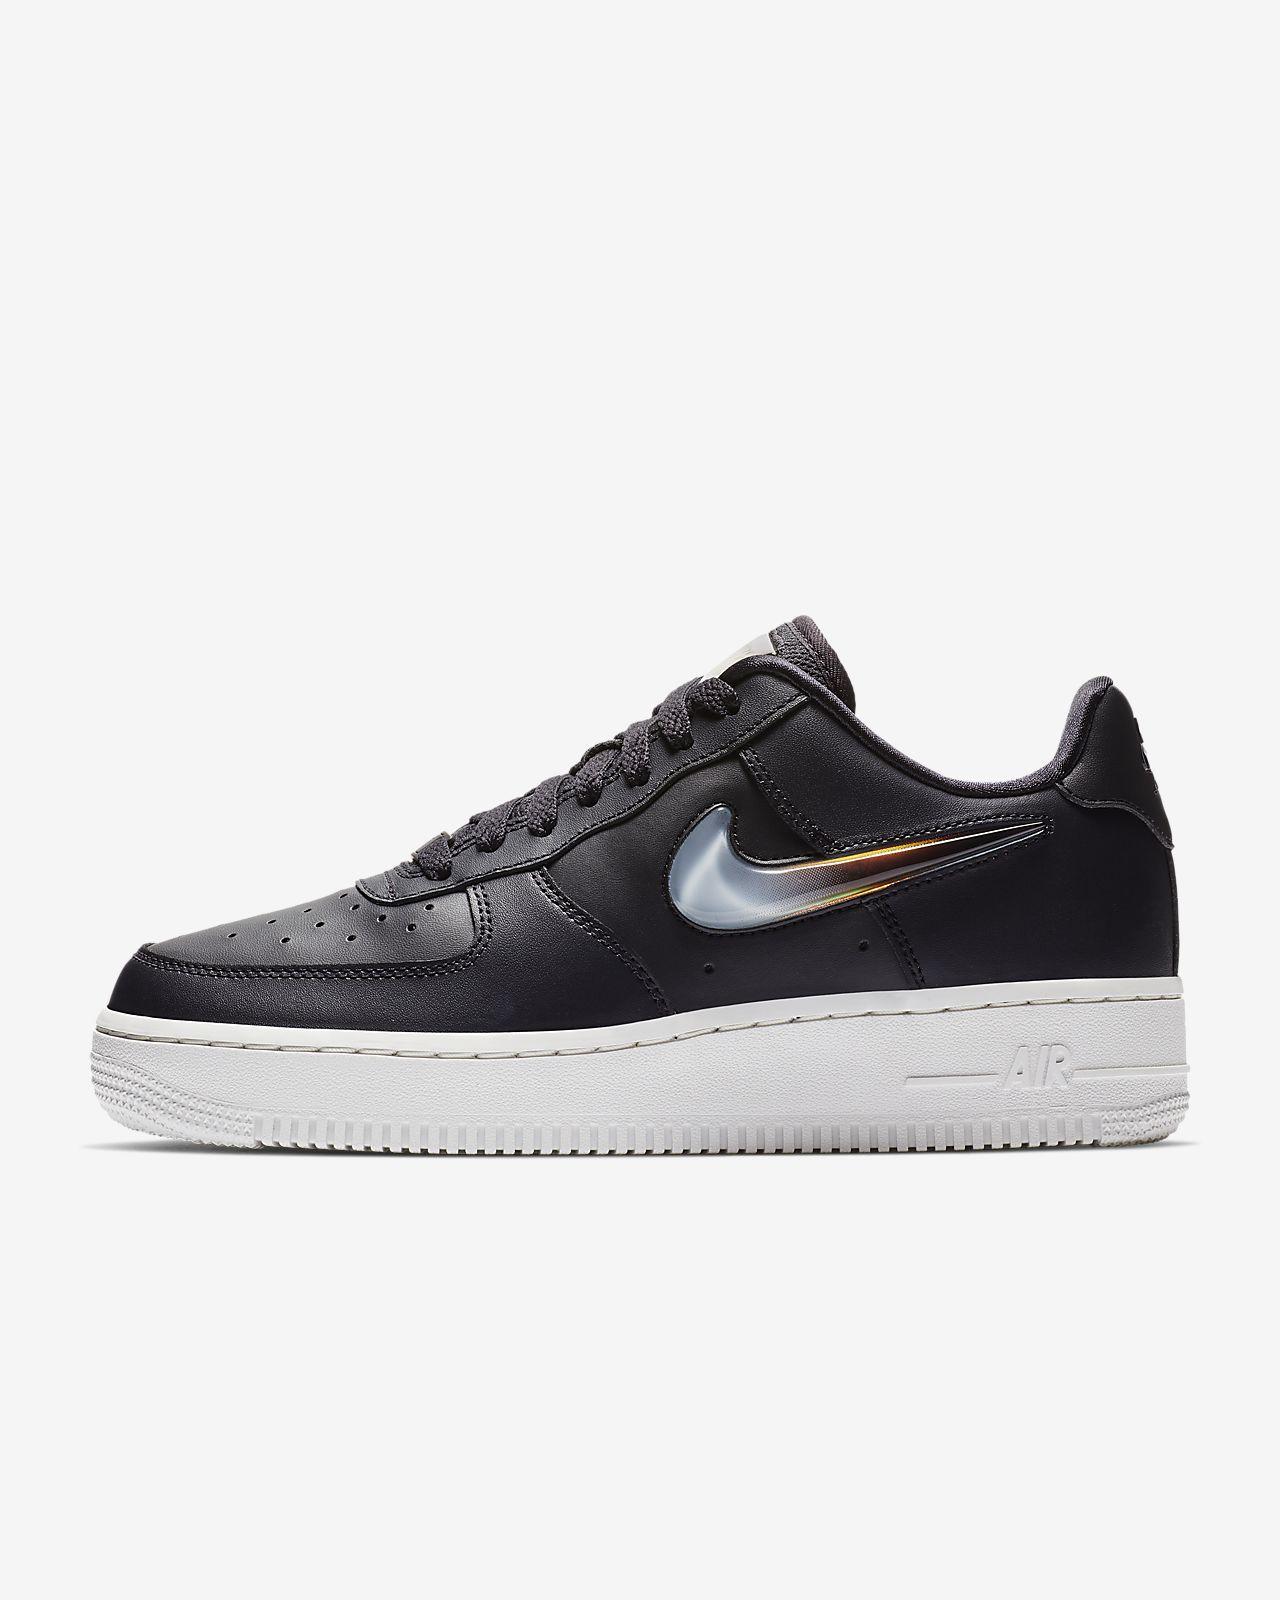 Chaussure Nike Air Force 1 '07 SE Premium pour Femme